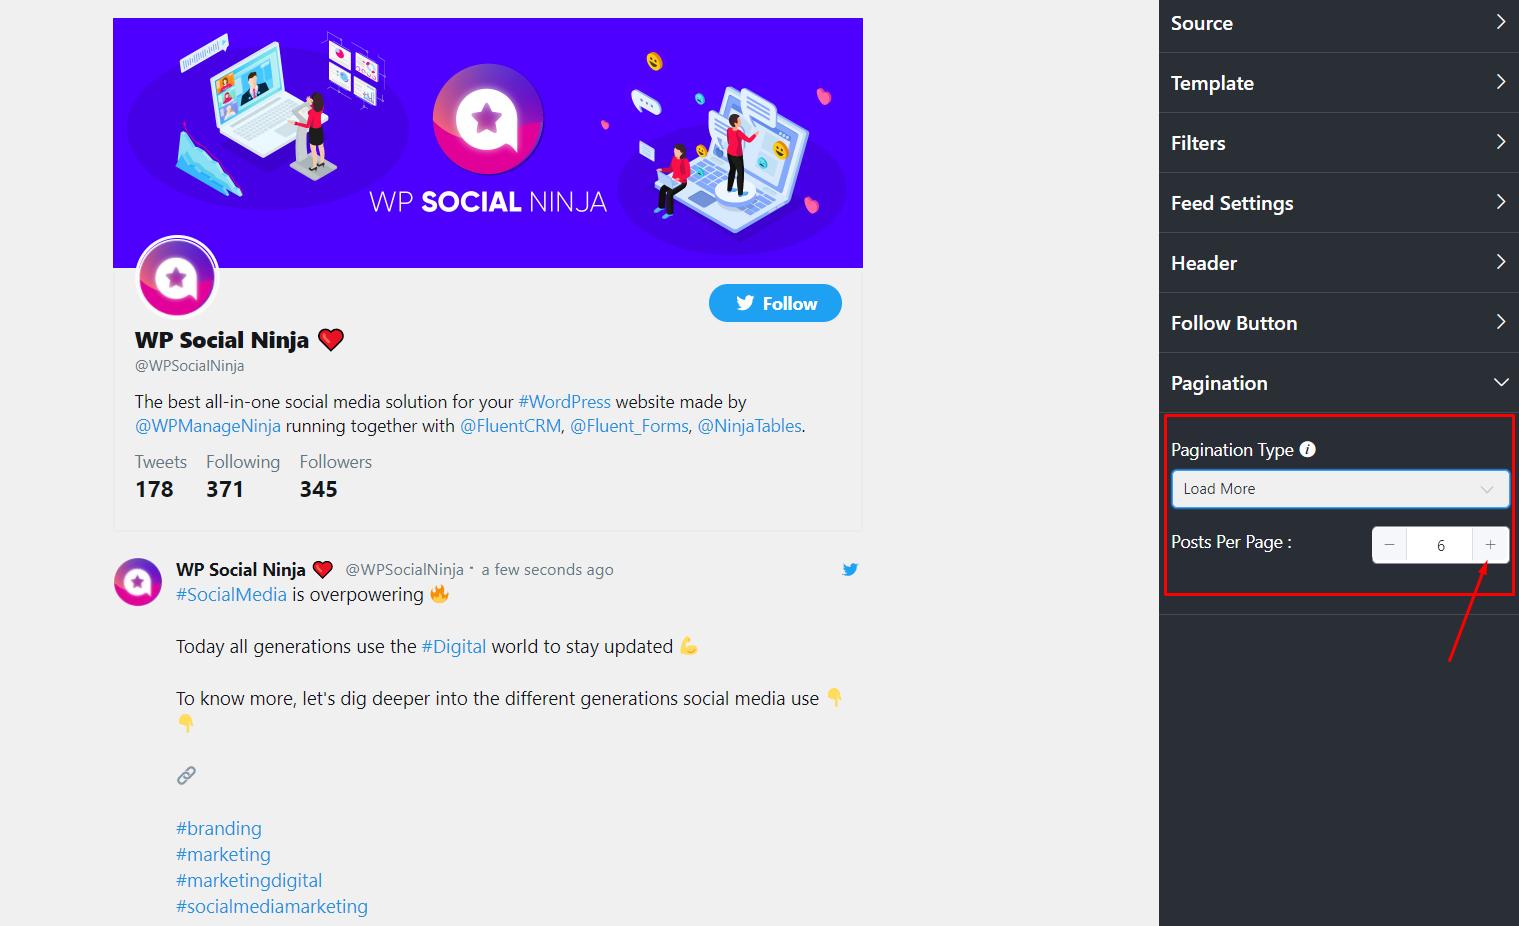 Twitter settings pagination type